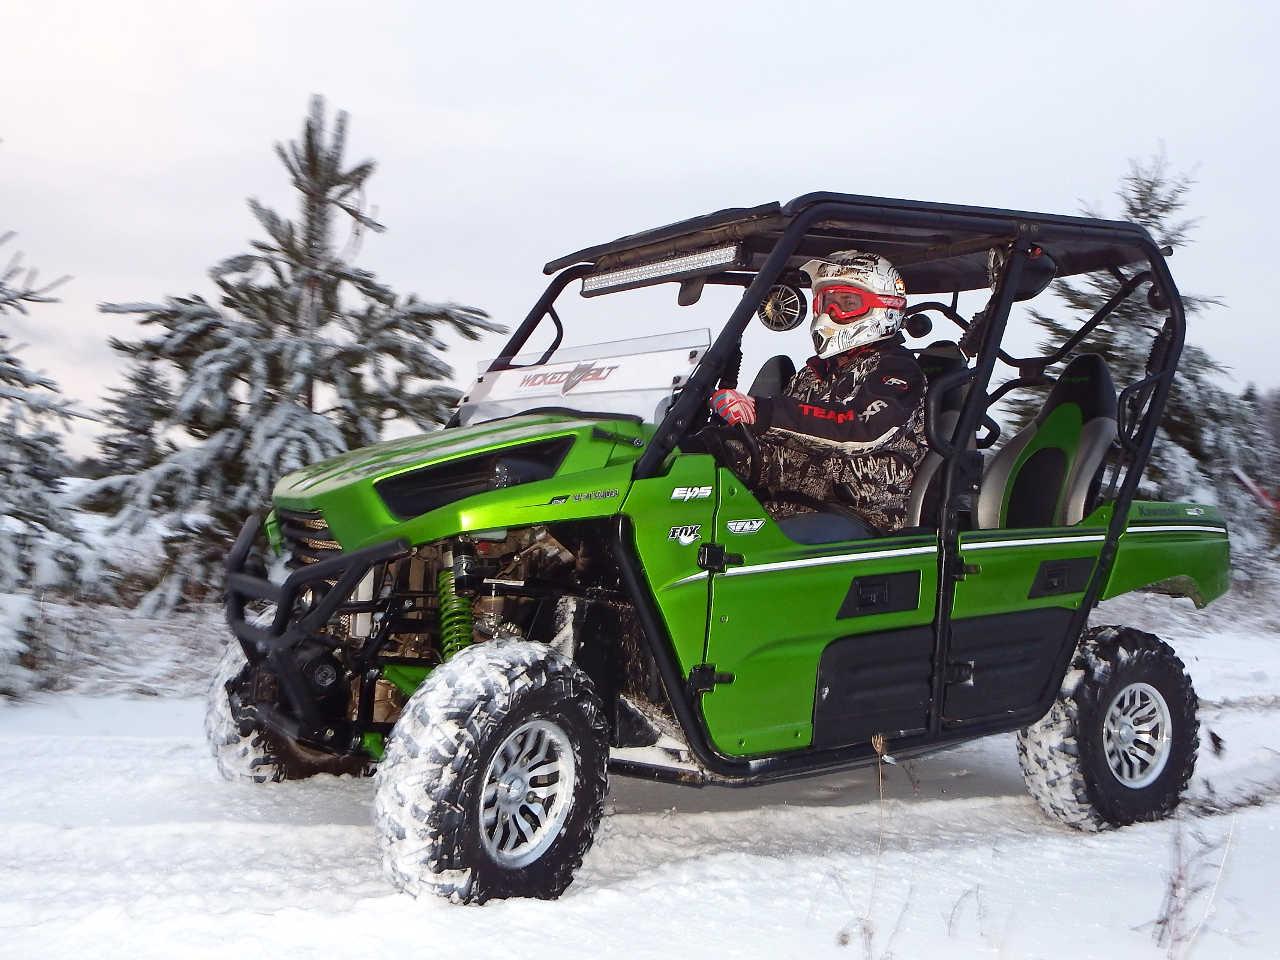 hight resolution of 2014 kawasaki teryx4 green left riding on snow